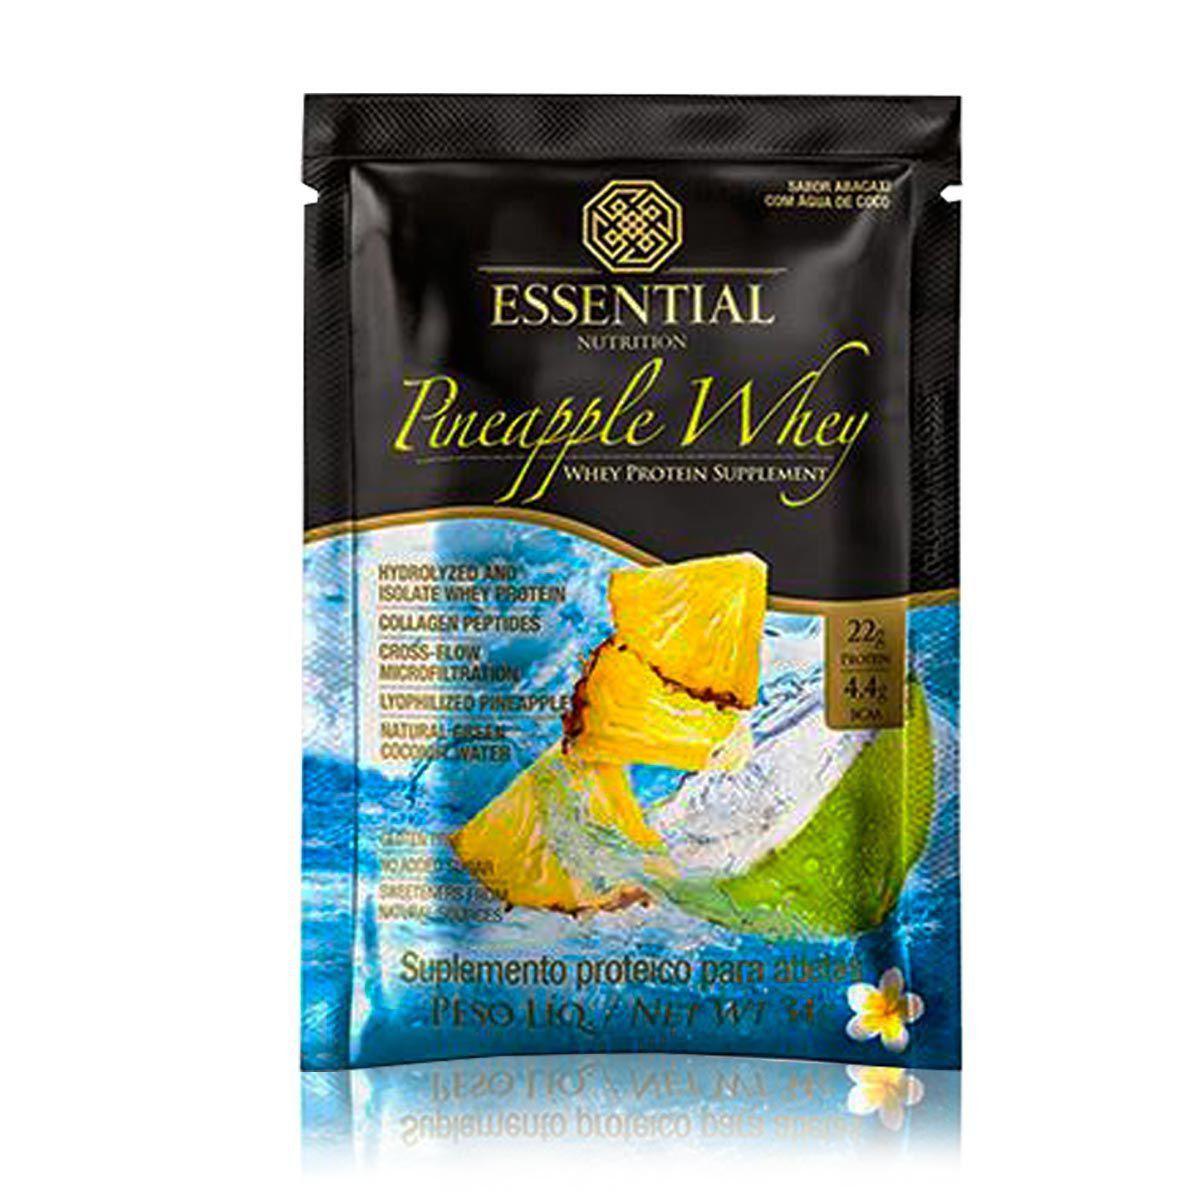 Pineapple Whey Sachê Essential Nutrition